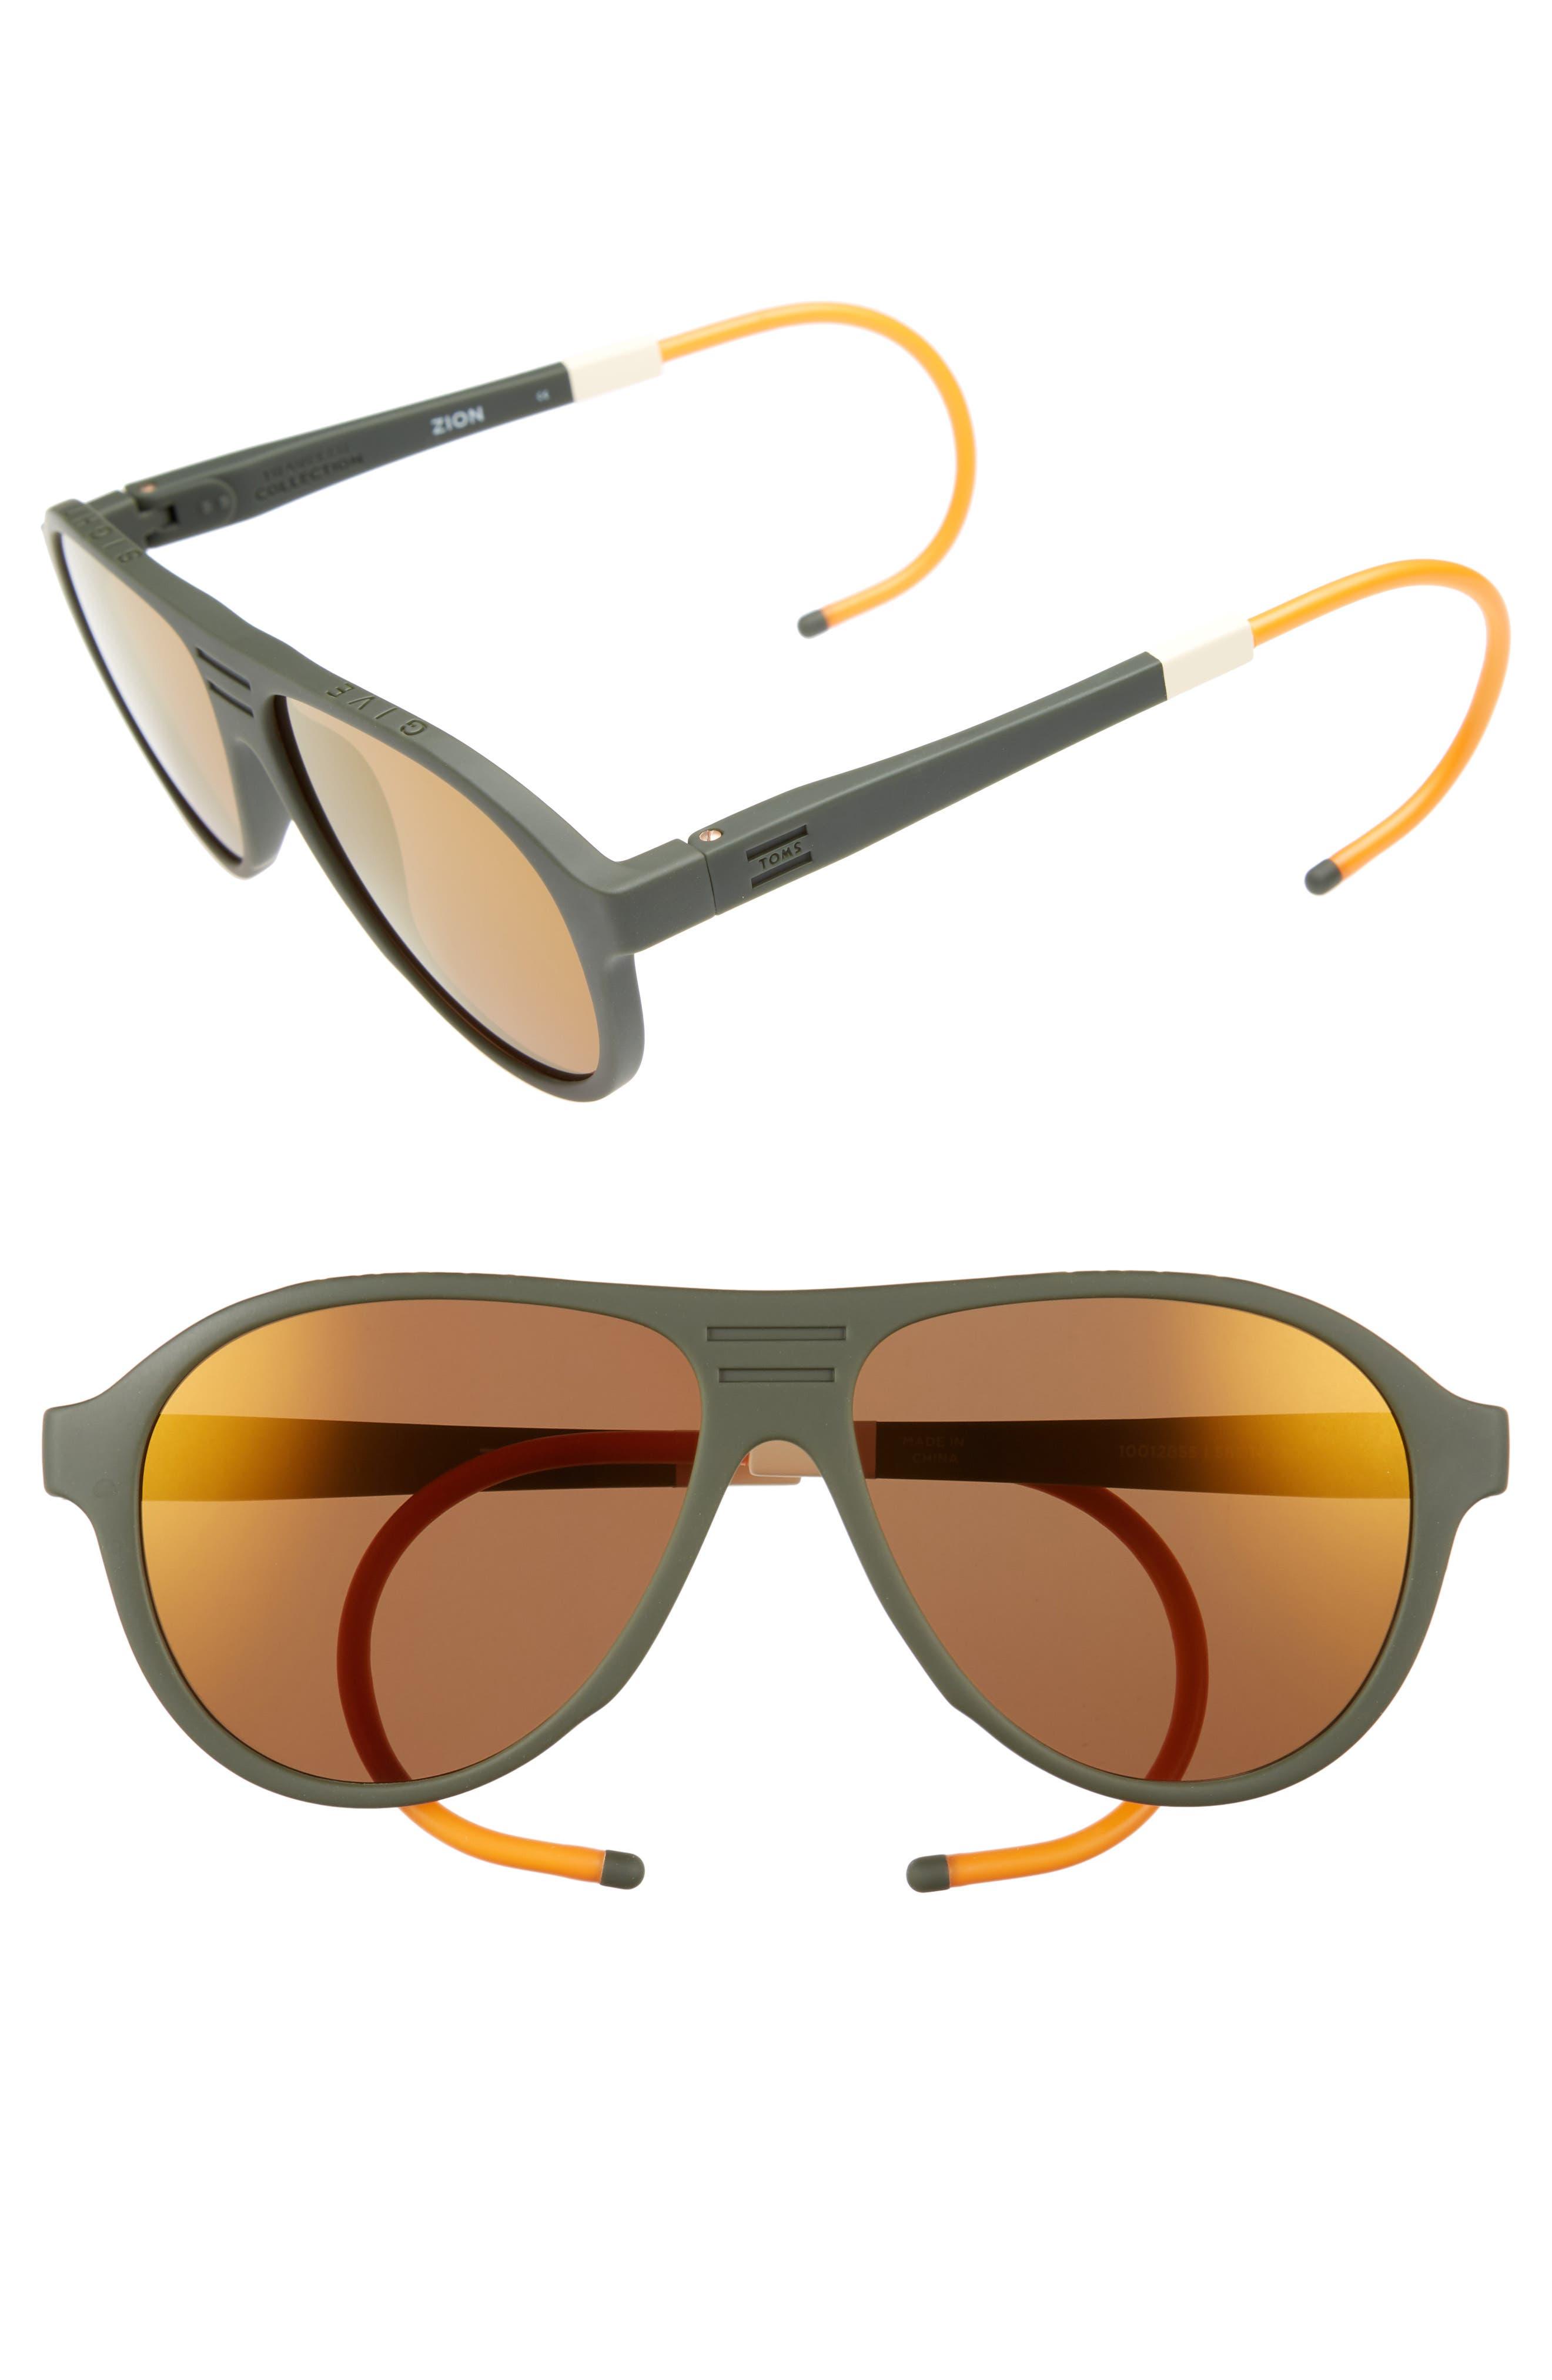 Traveler Zion 57mm Aviator Sunglasses,                         Main,                         color, Matte Rifle Green/ Gold Mirror